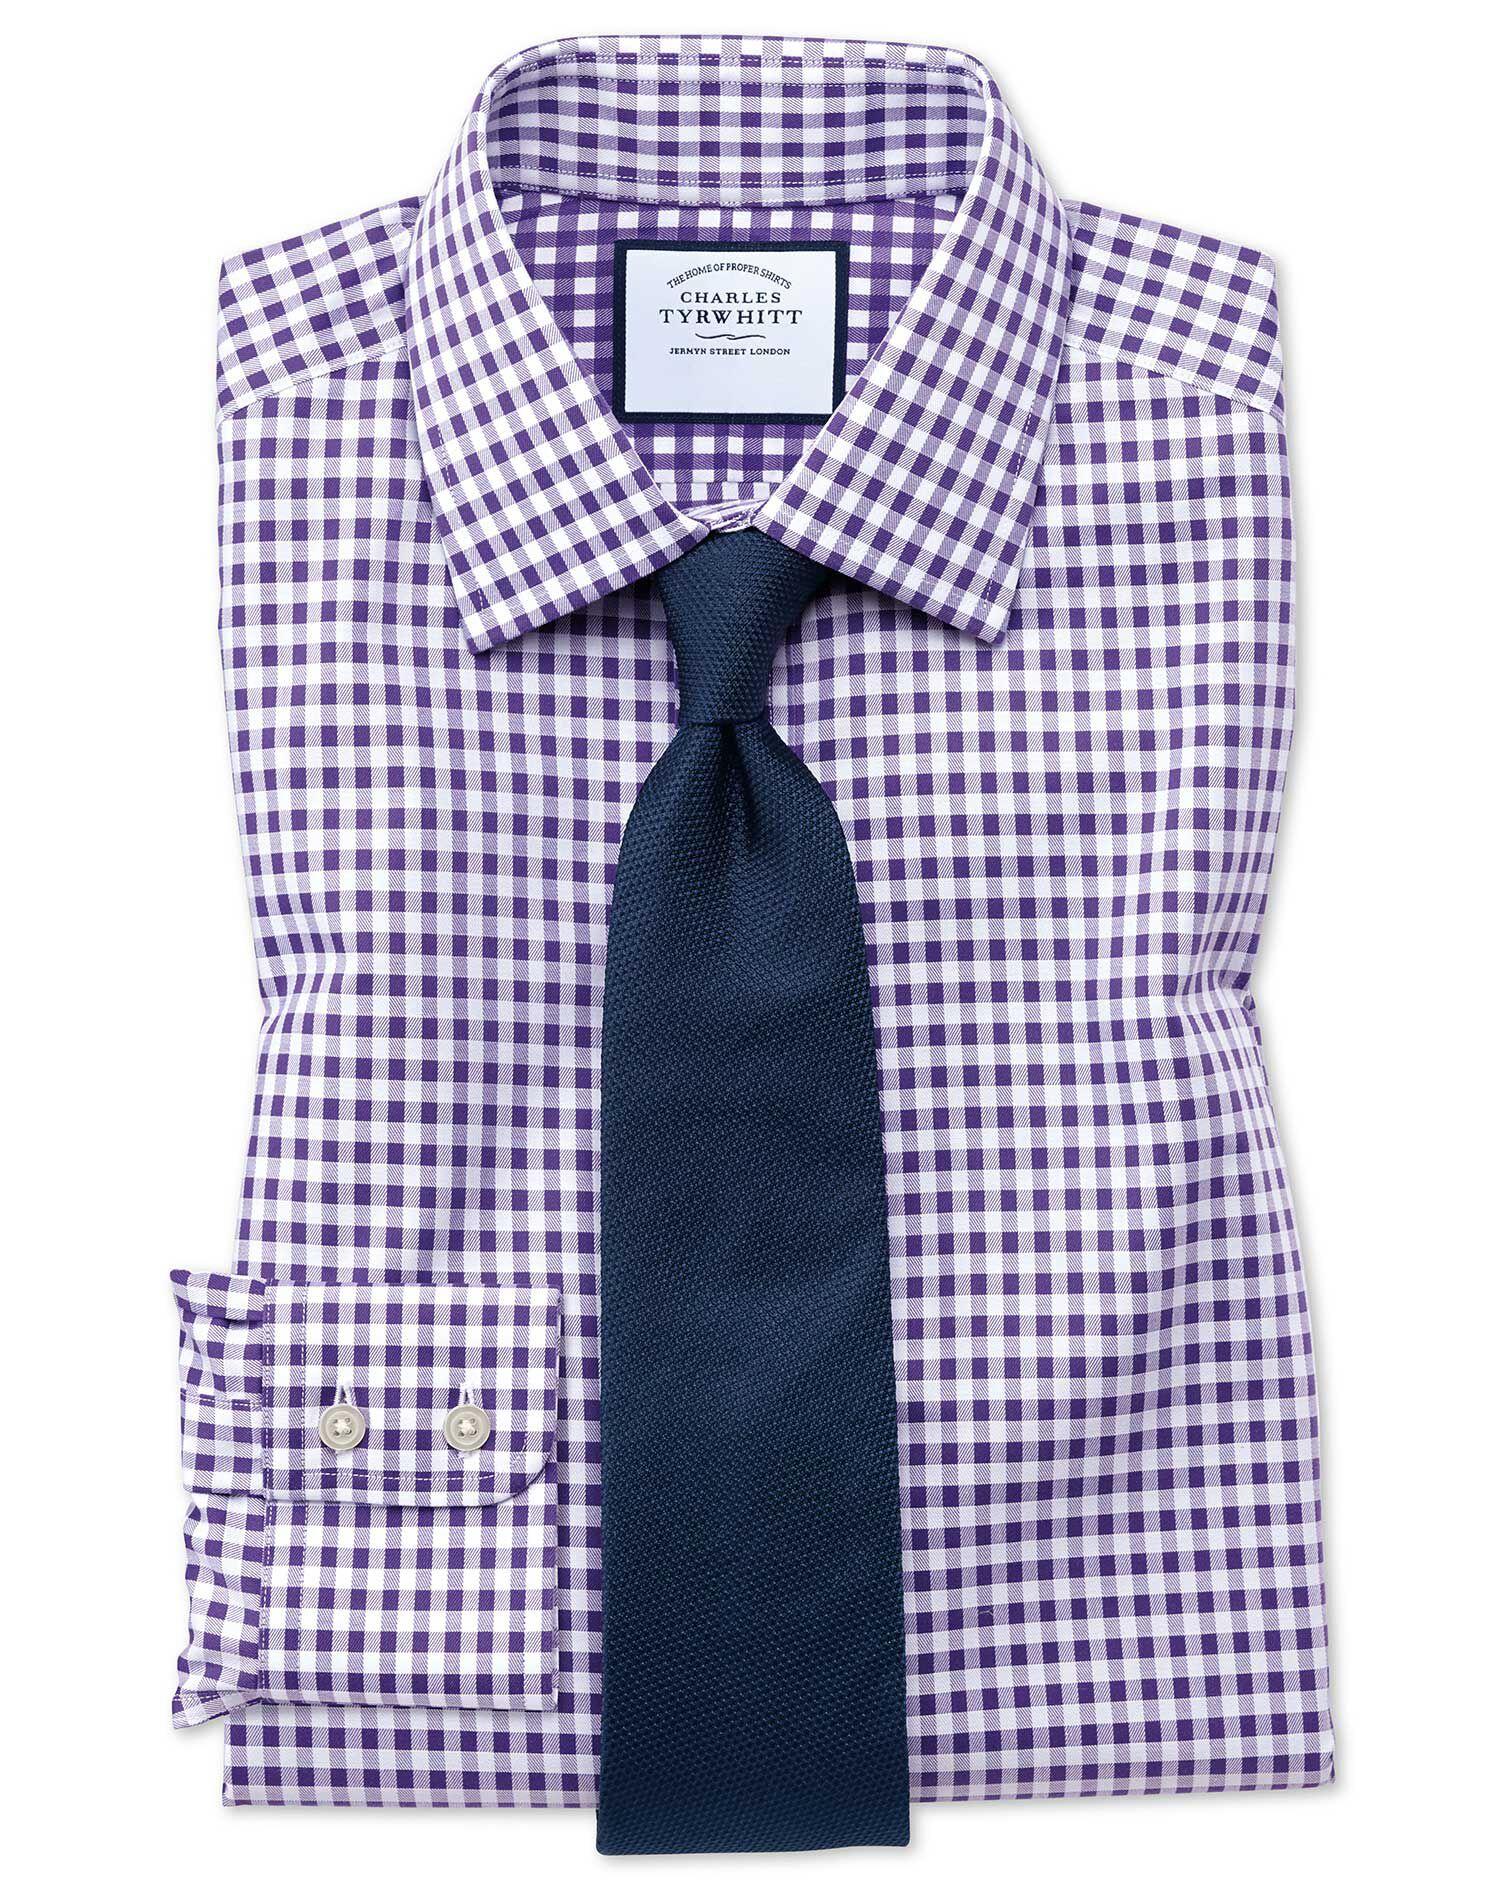 Slim Fit Non-Iron Gingham Purple Cotton Formal Shirt Single Cuff Size 15.5/35 by Charles Tyrwhitt